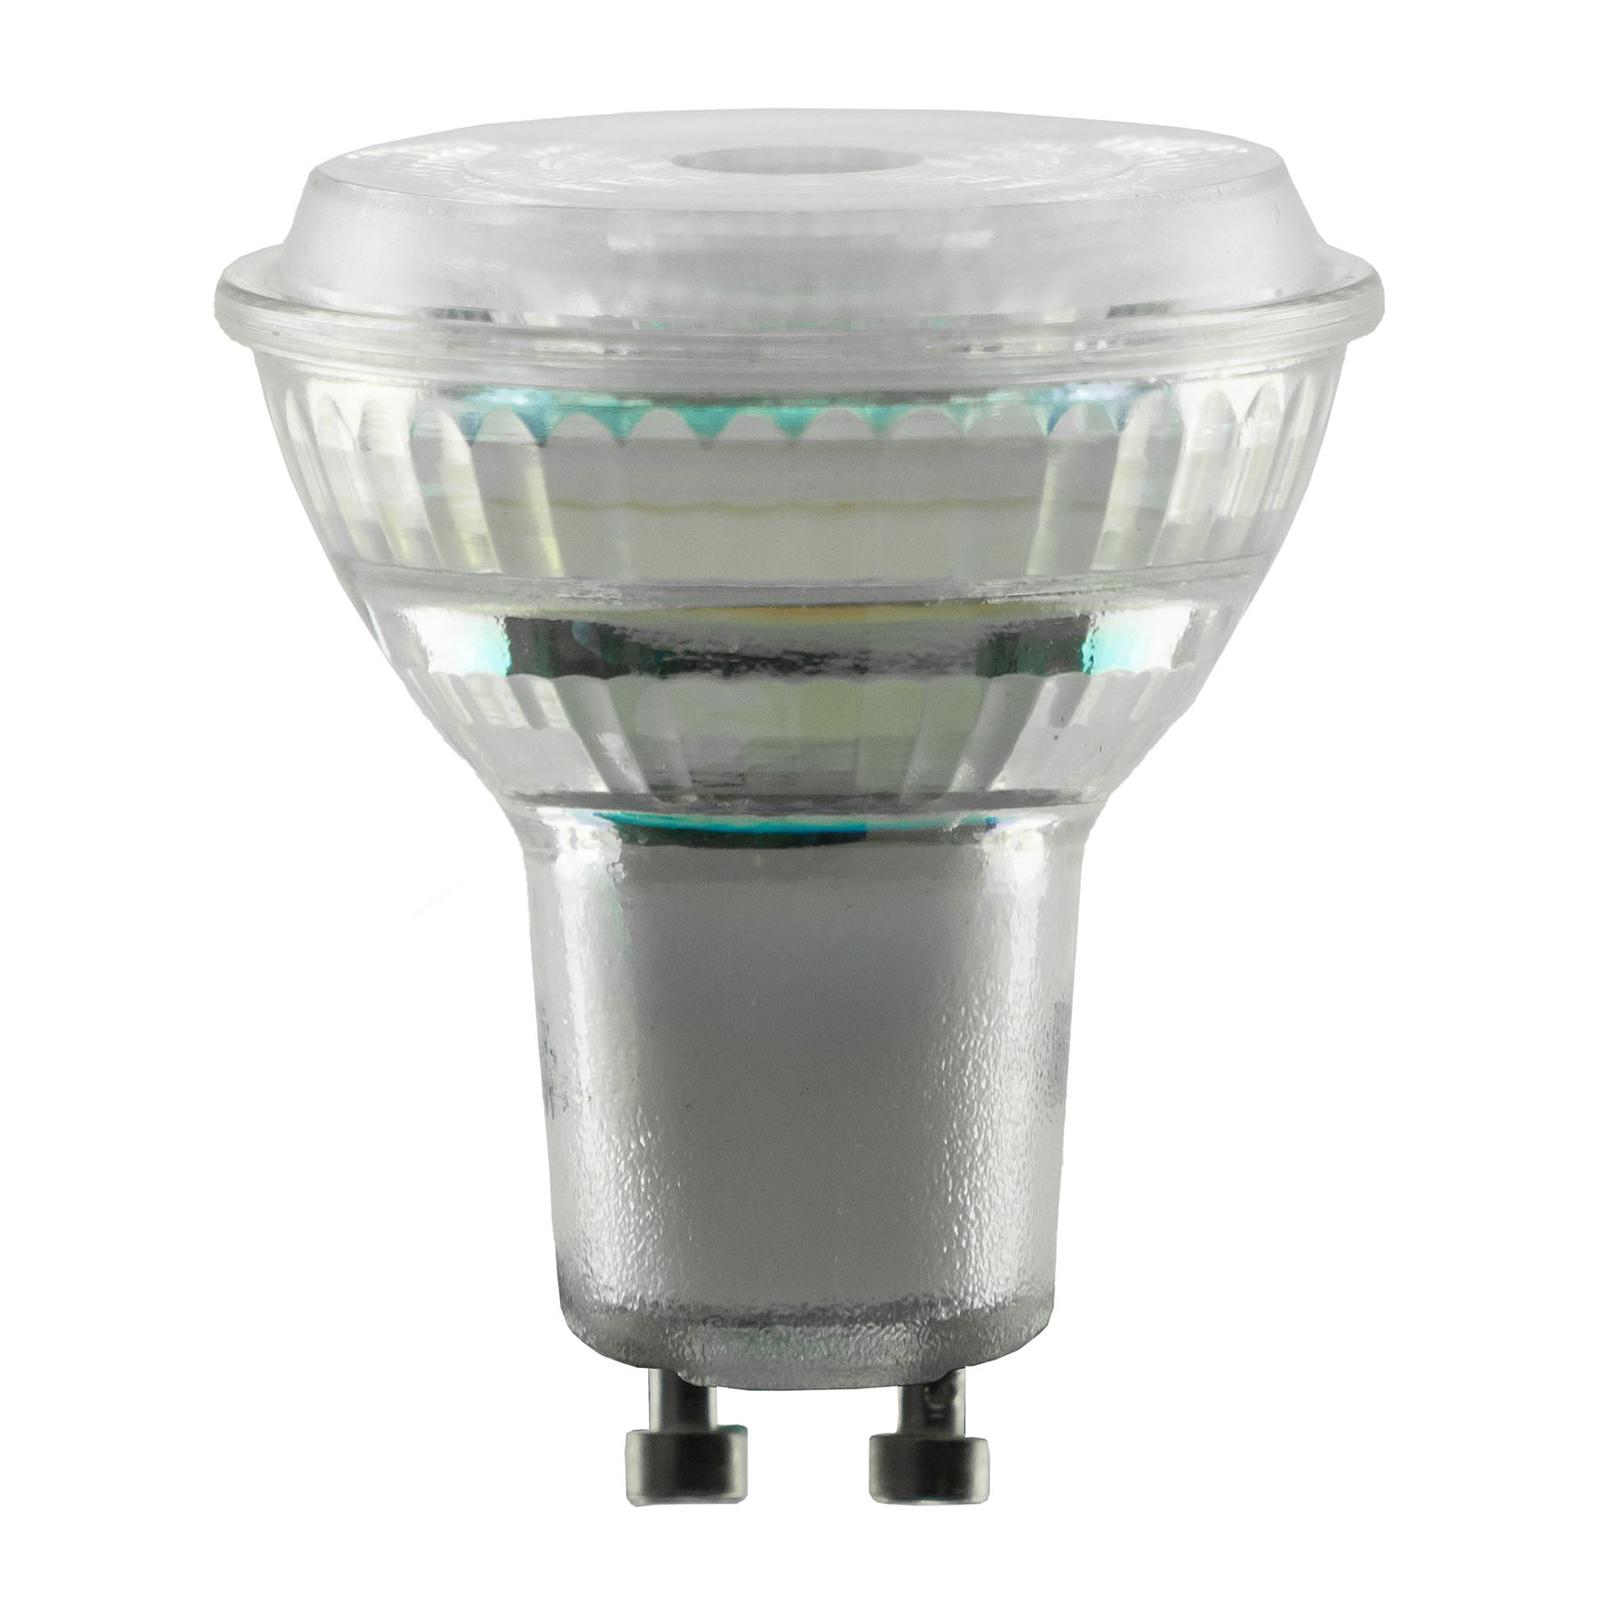 SEGULA LED-Reflektor GU10 5,2W 2.700K dimmbar 10°